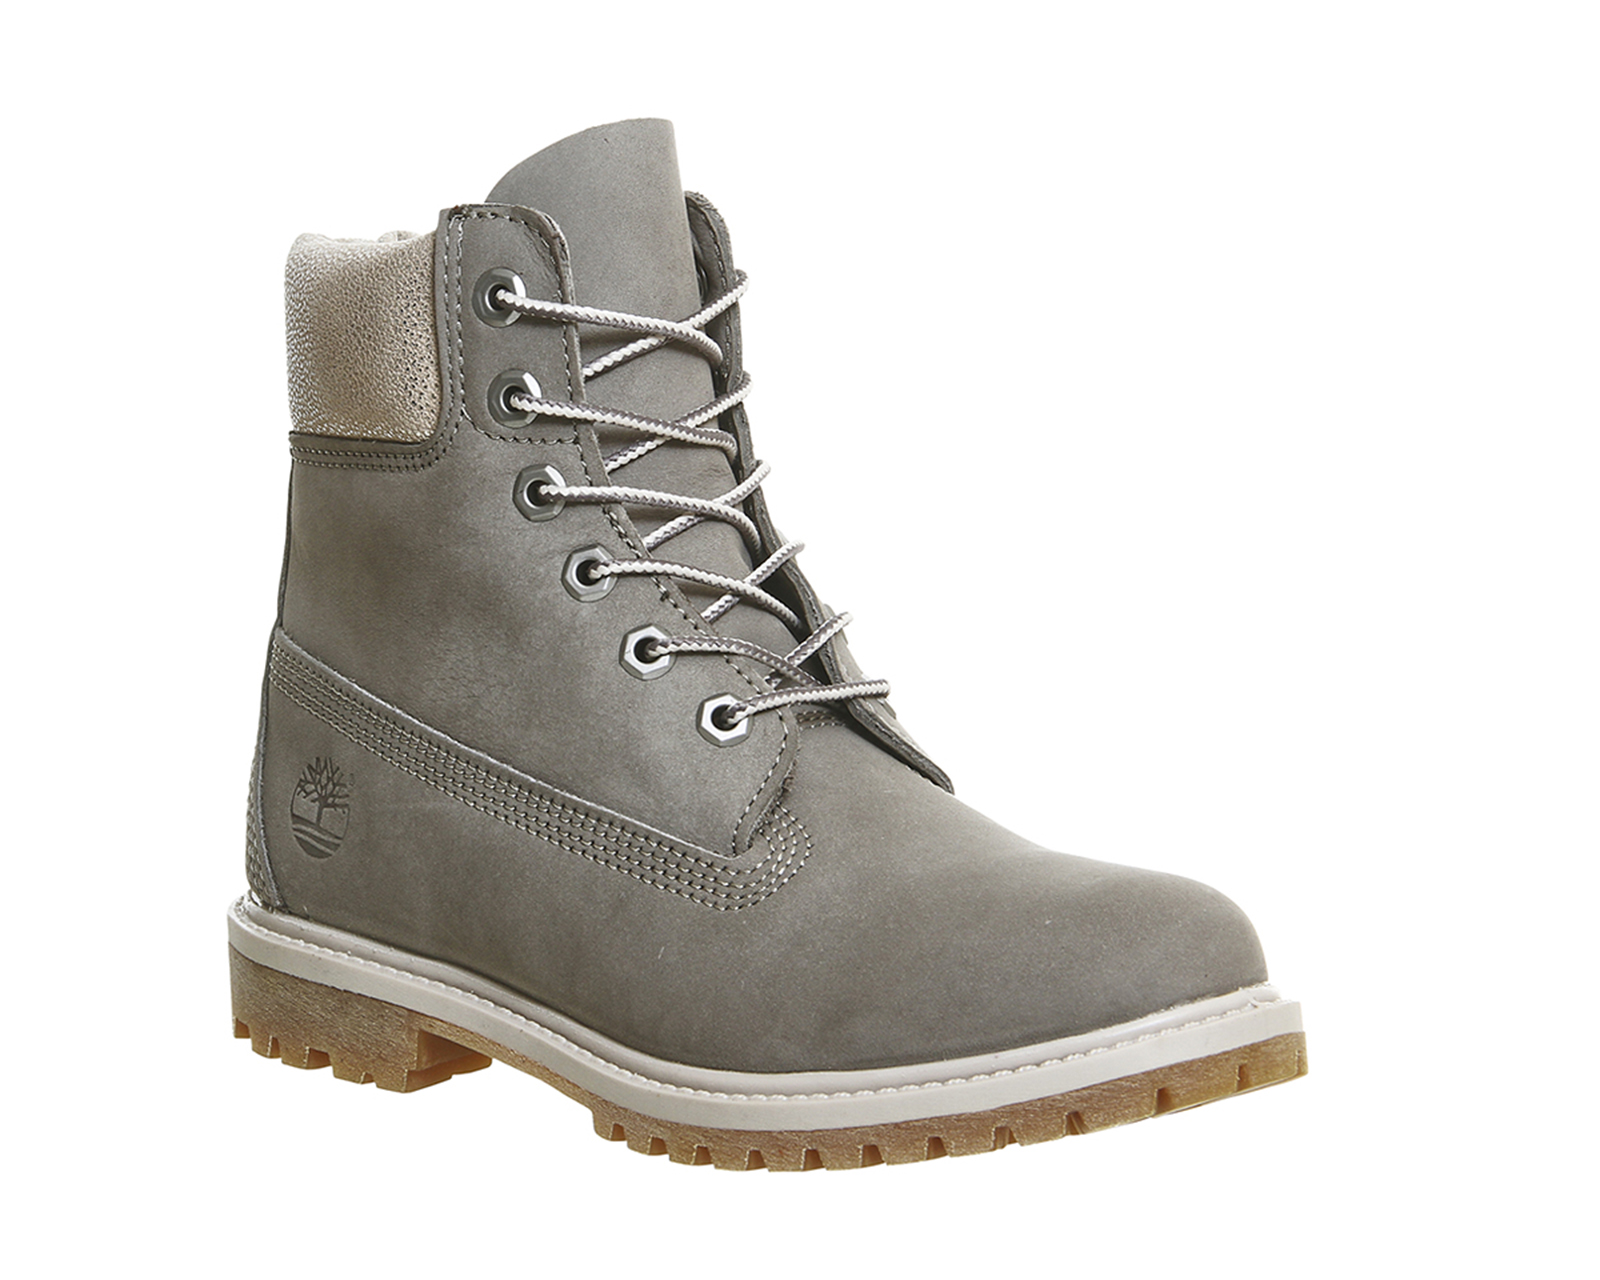 Chaussures femme Timberland 6 Premium Bottes de neige